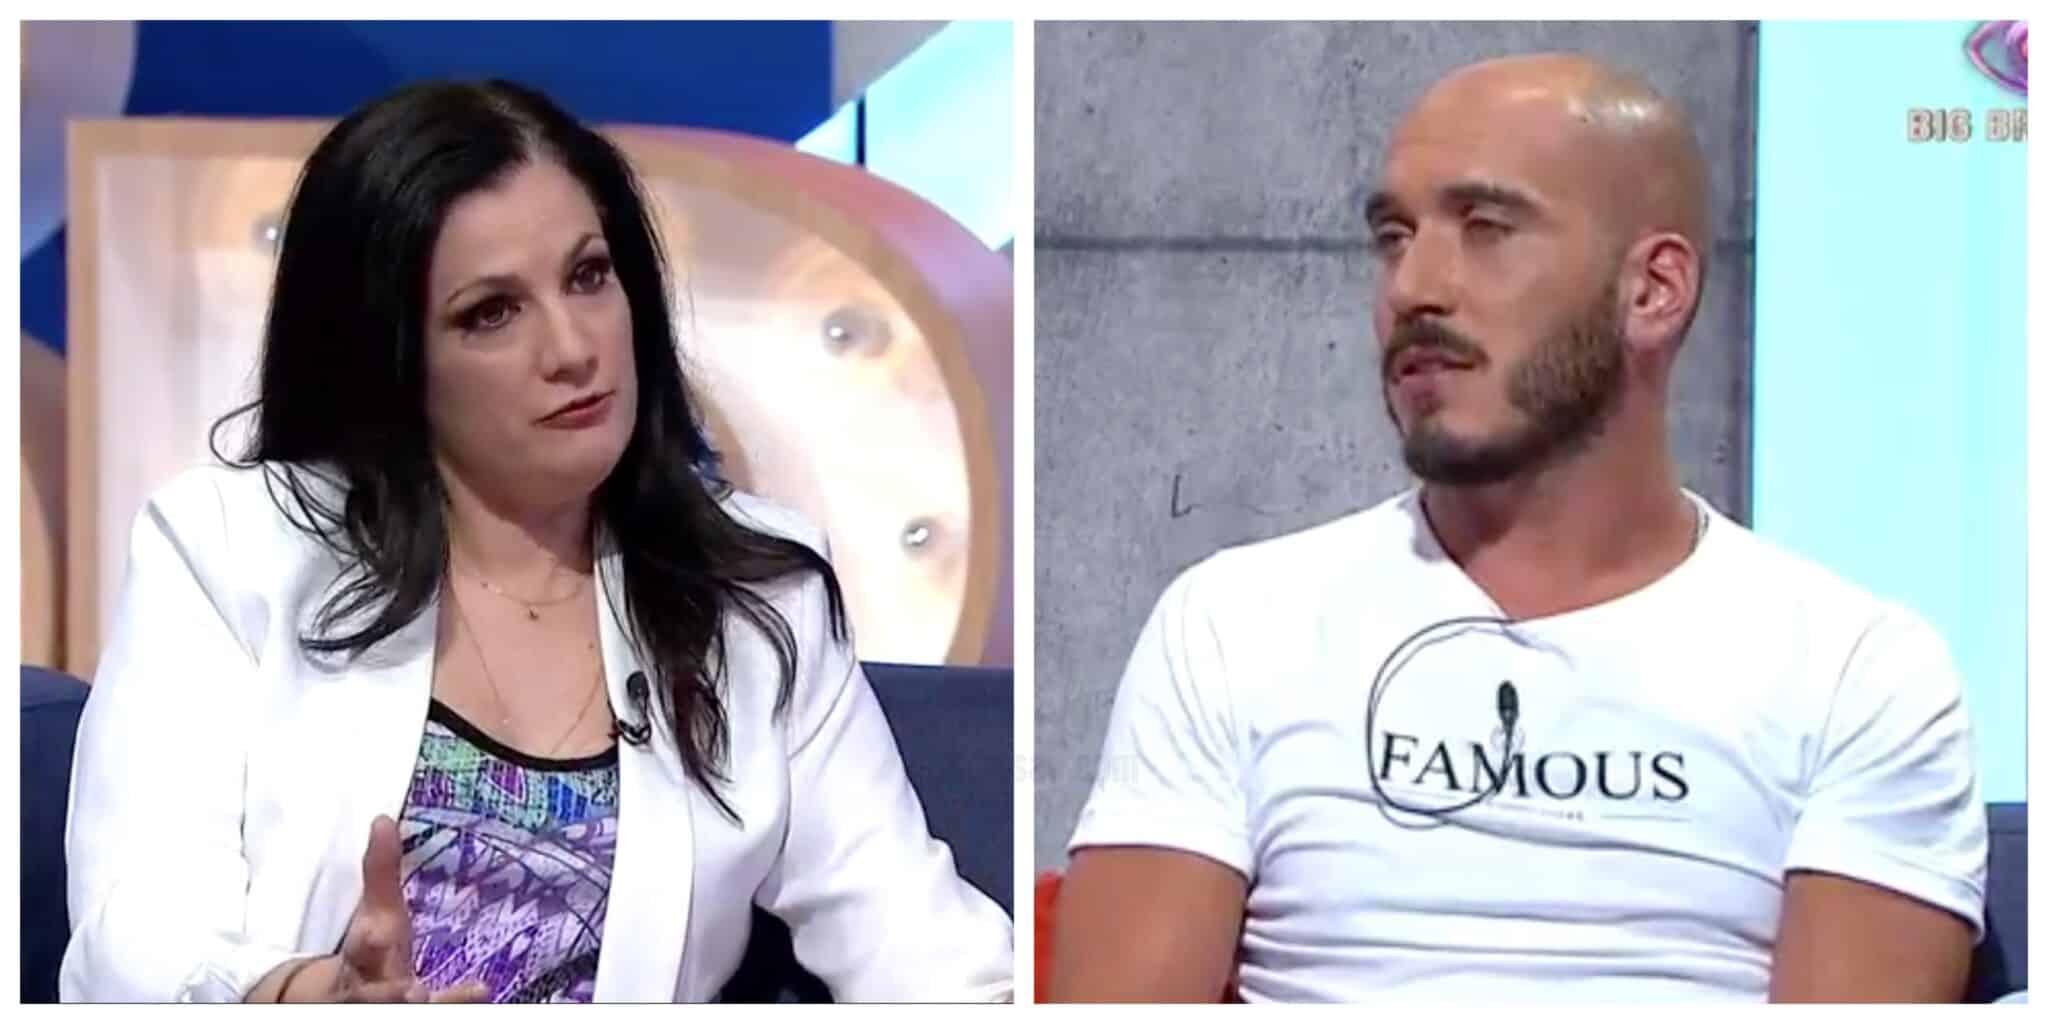 Teresa-Paula-Marques-Daniel-Monteiro-Extra-Big-Brother